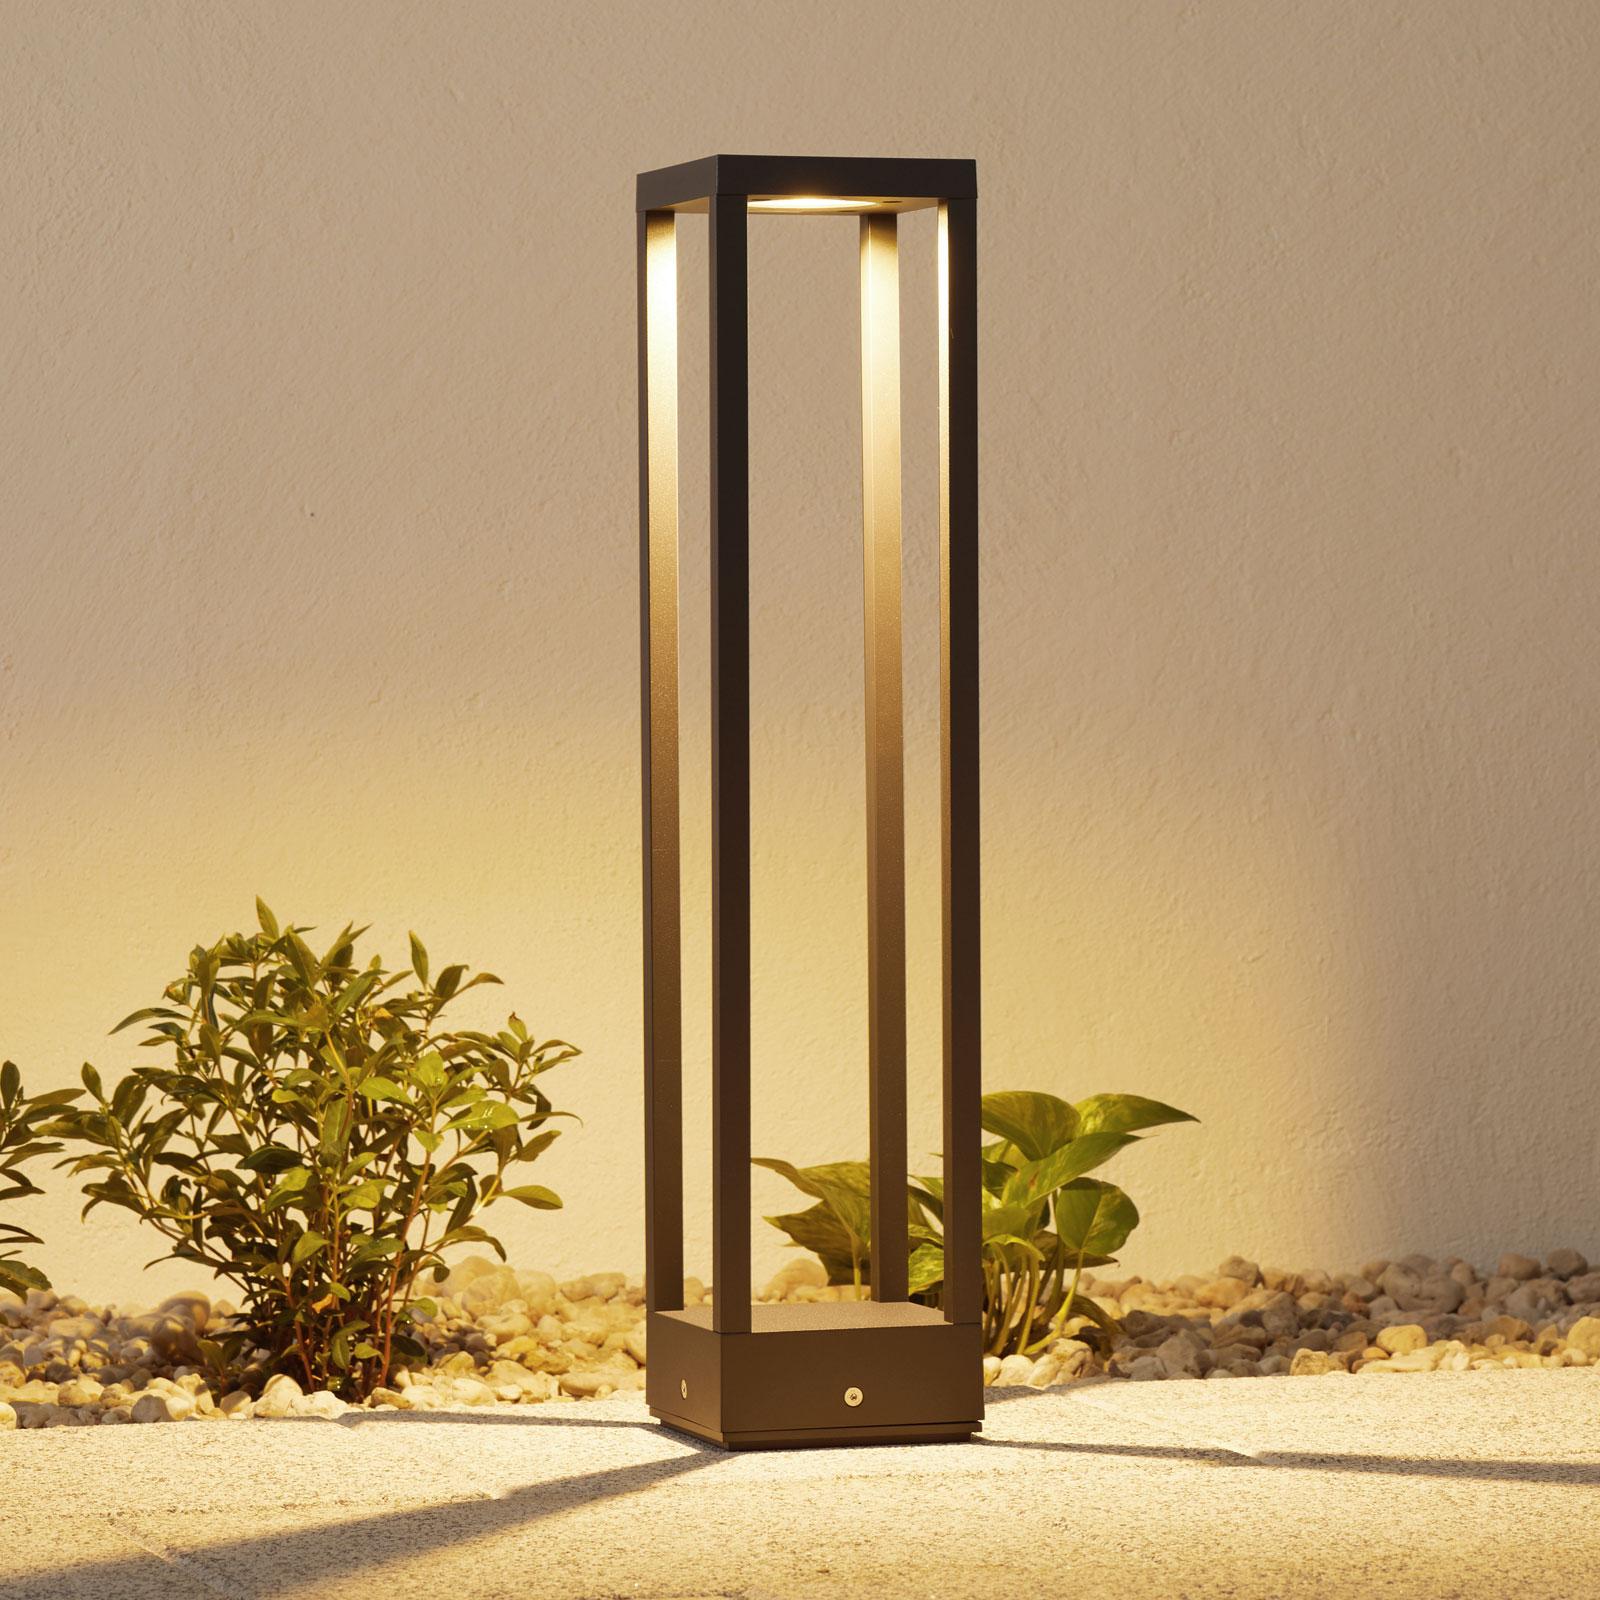 LED-pylväsvalaisin Carlota, tummanharmaa, 65 cm